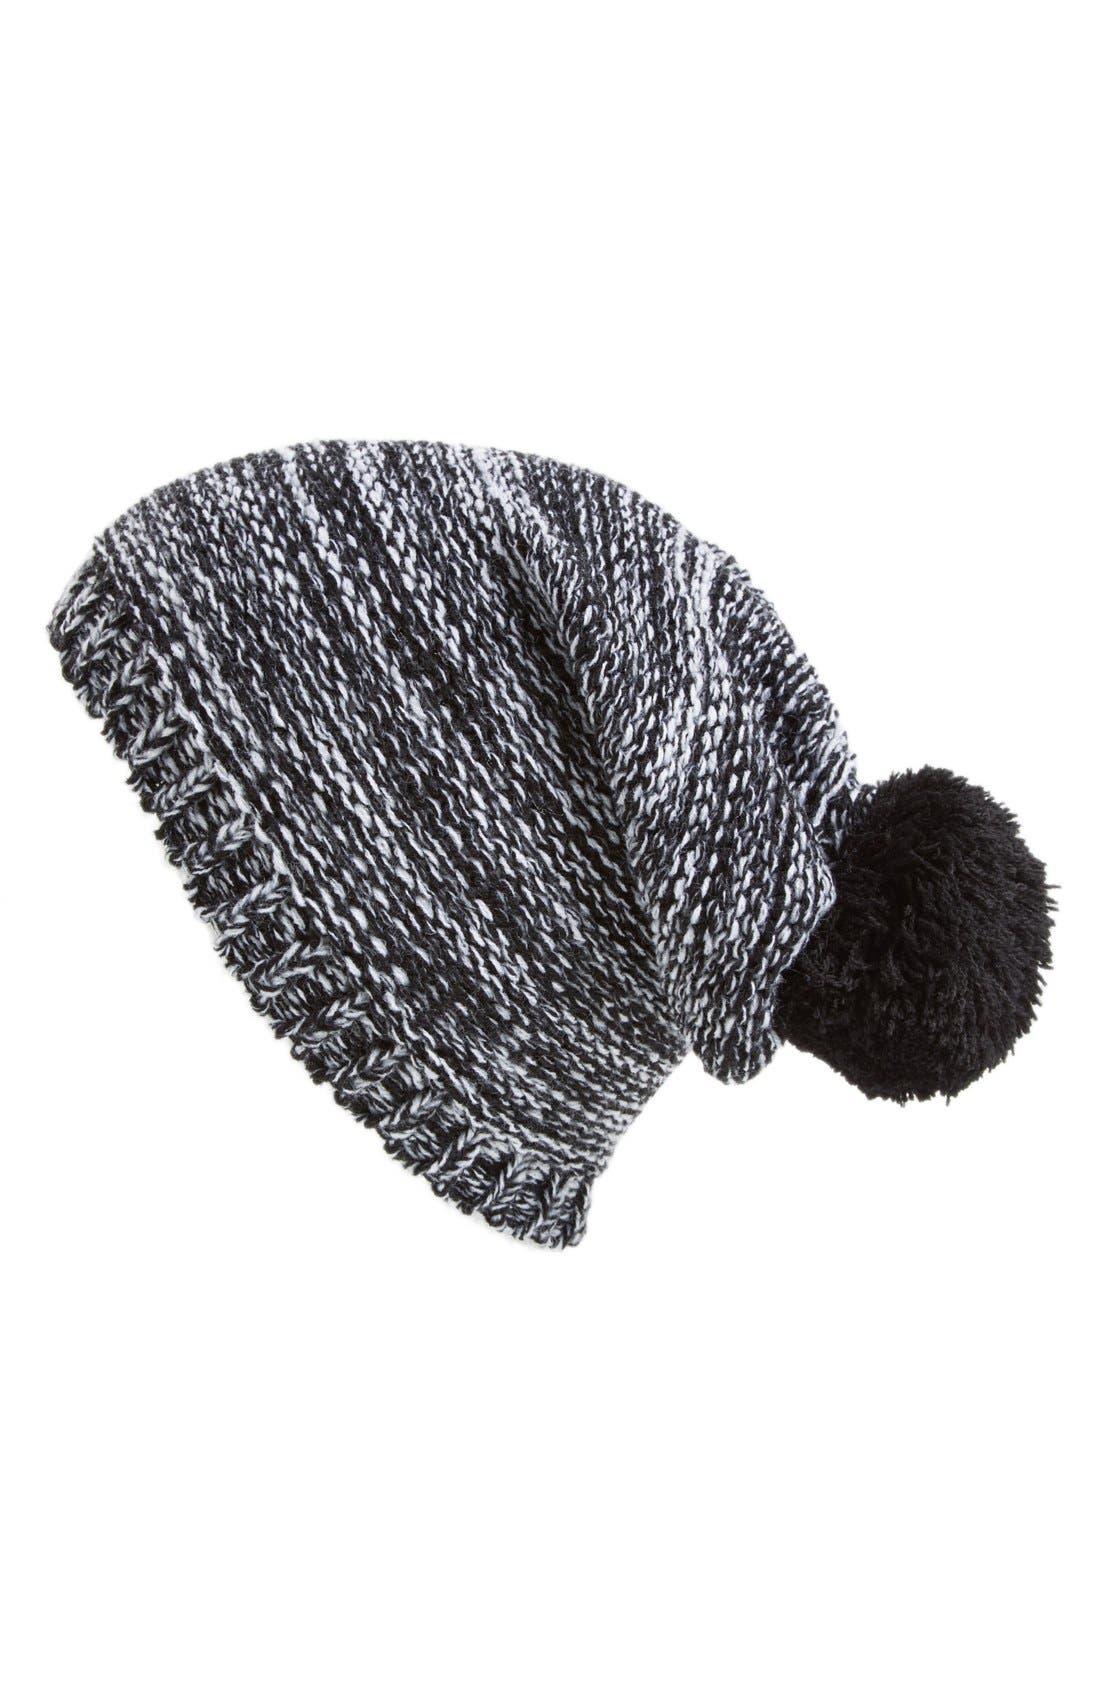 Main Image - Capelli of New York Marled Knit Beanie (Juniors)